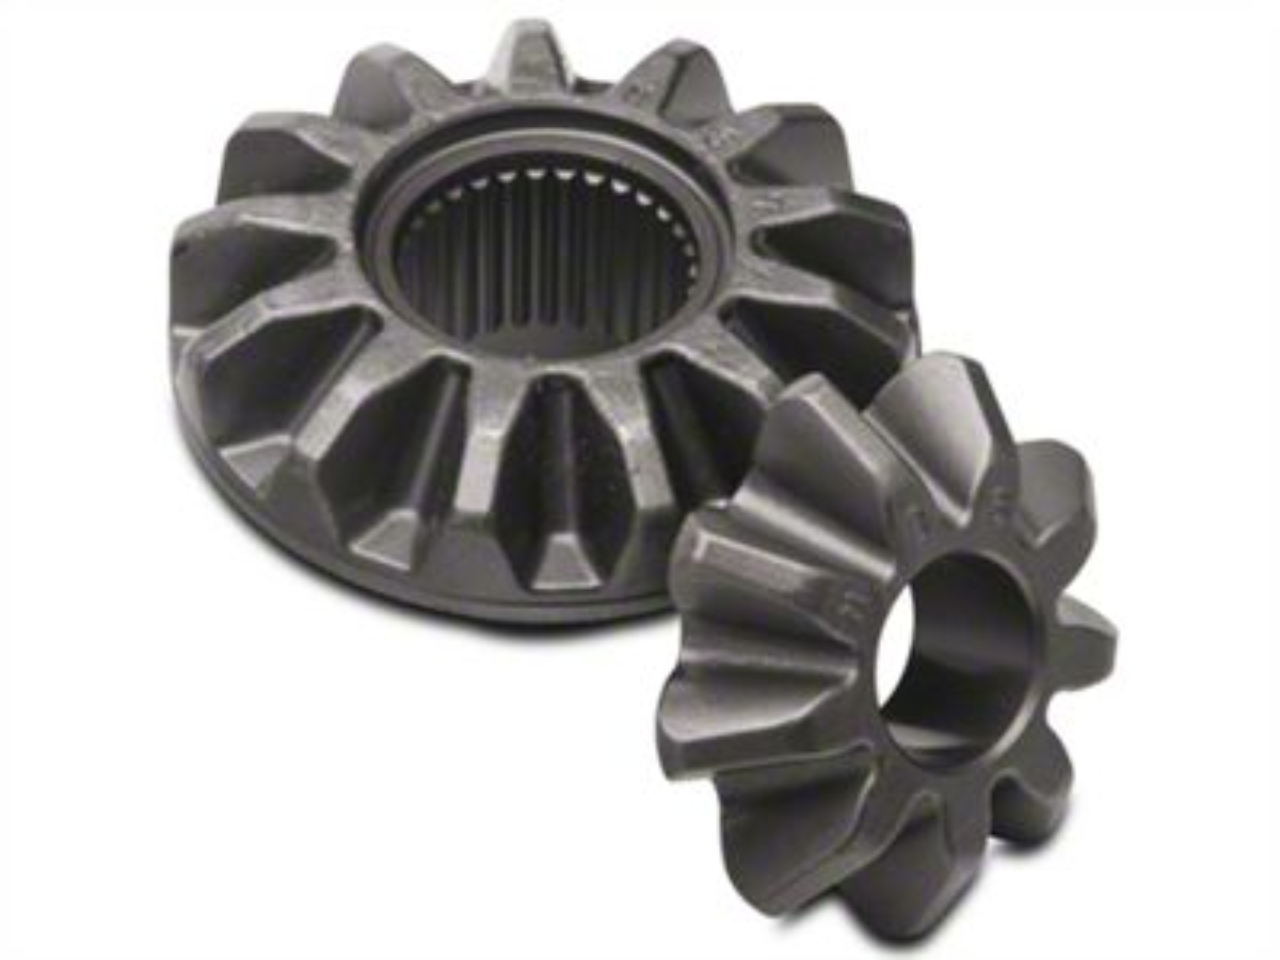 Ford Limited Slip Differential Spider Gears - 31 Spline 8.8 in (03-04 Cobra; 05-14 V8; 11-14 V6)